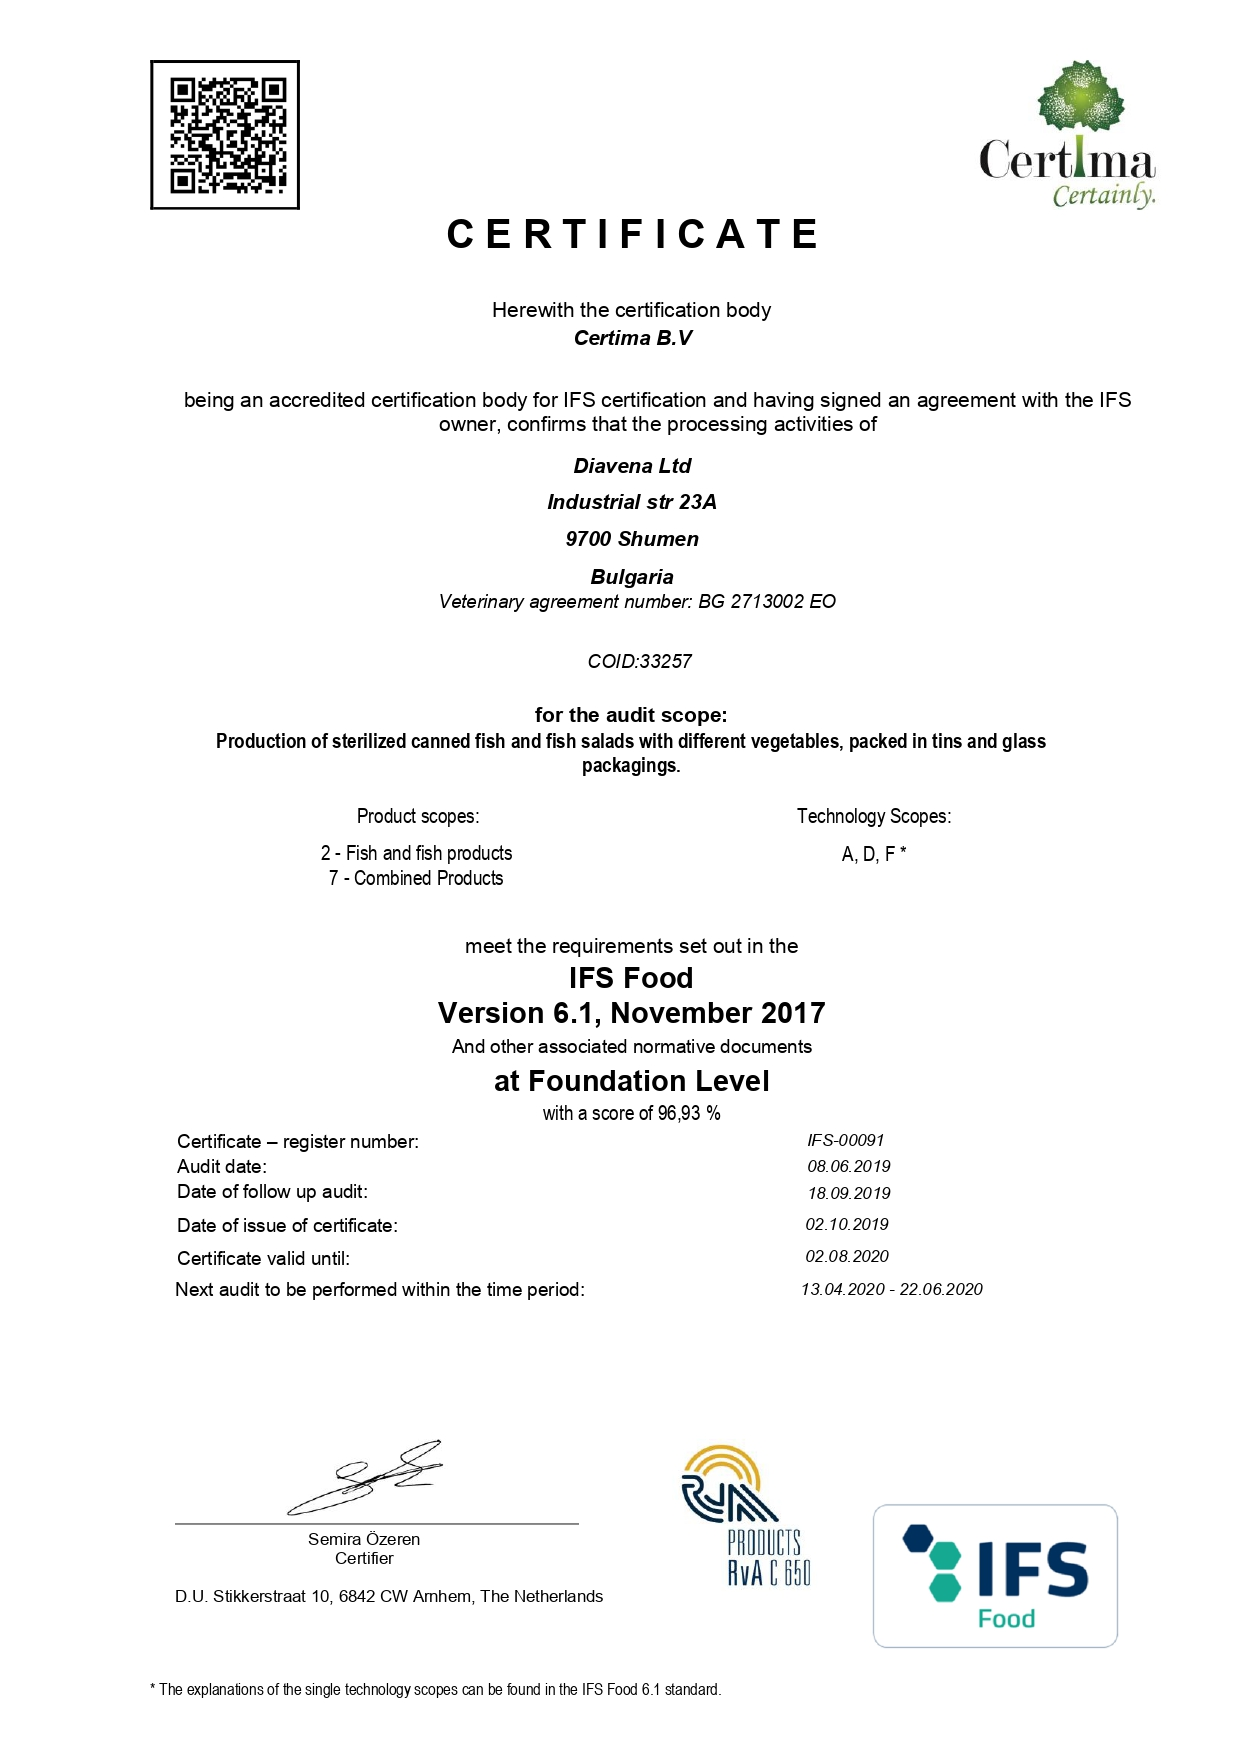 Certificate from Certima B.V